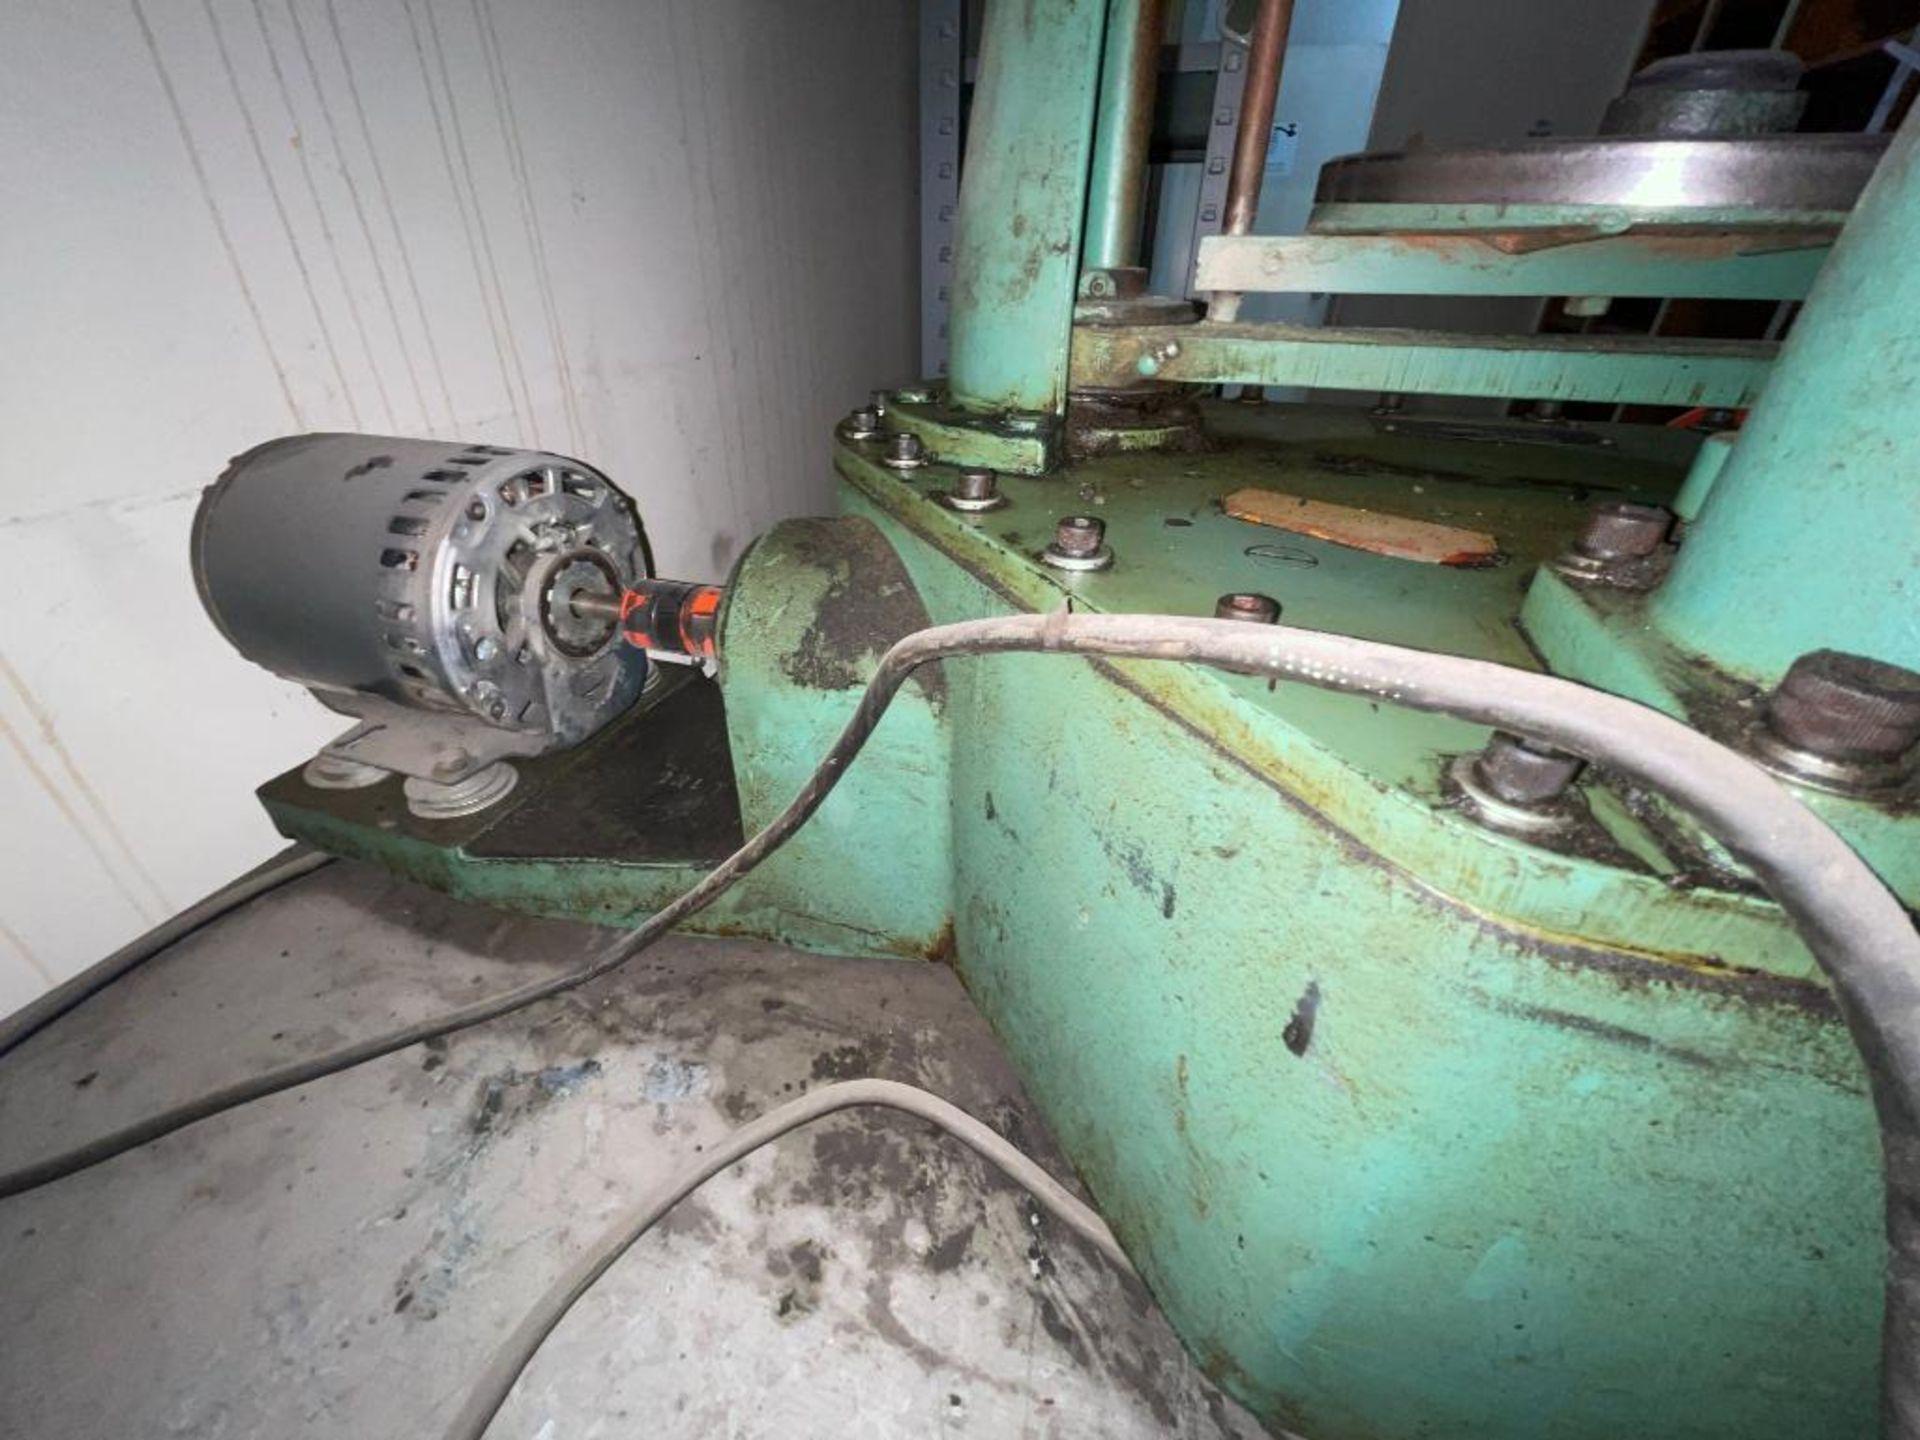 Ro-Tap testing sieve shaker - Image 6 of 8